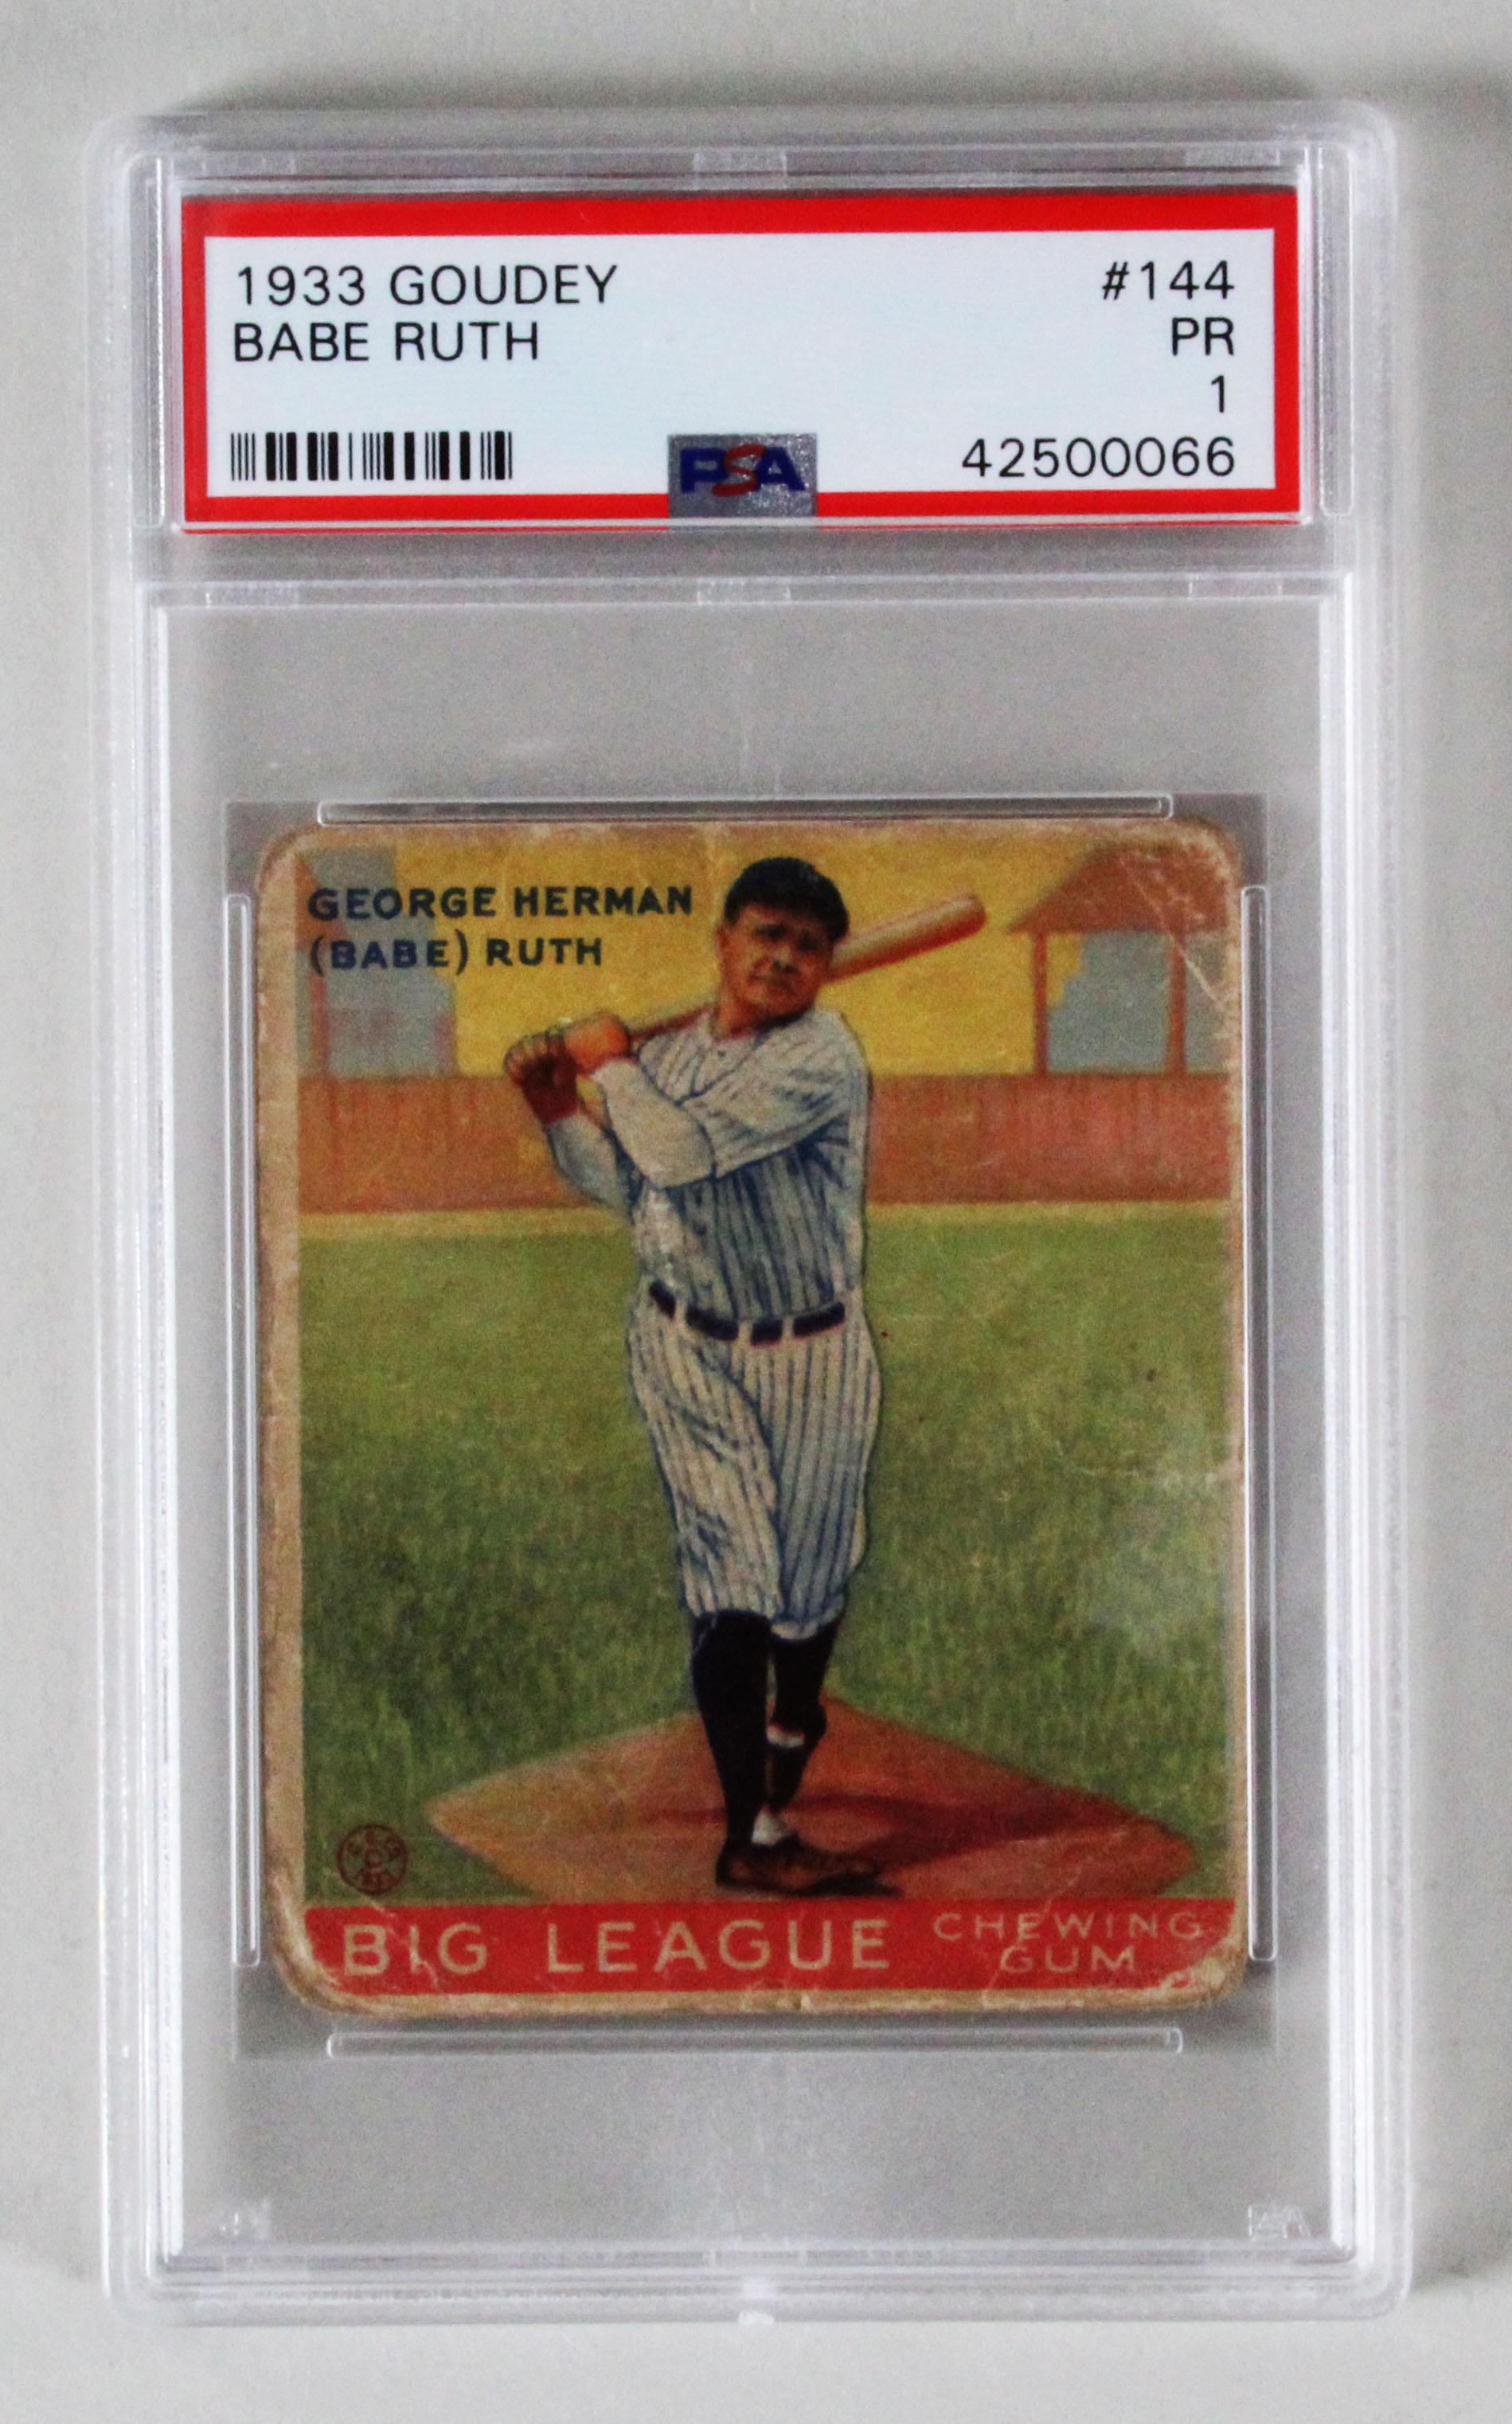 1933 Goudey Babe Ruth Baseball Card Graded 144 Psa Pr 1